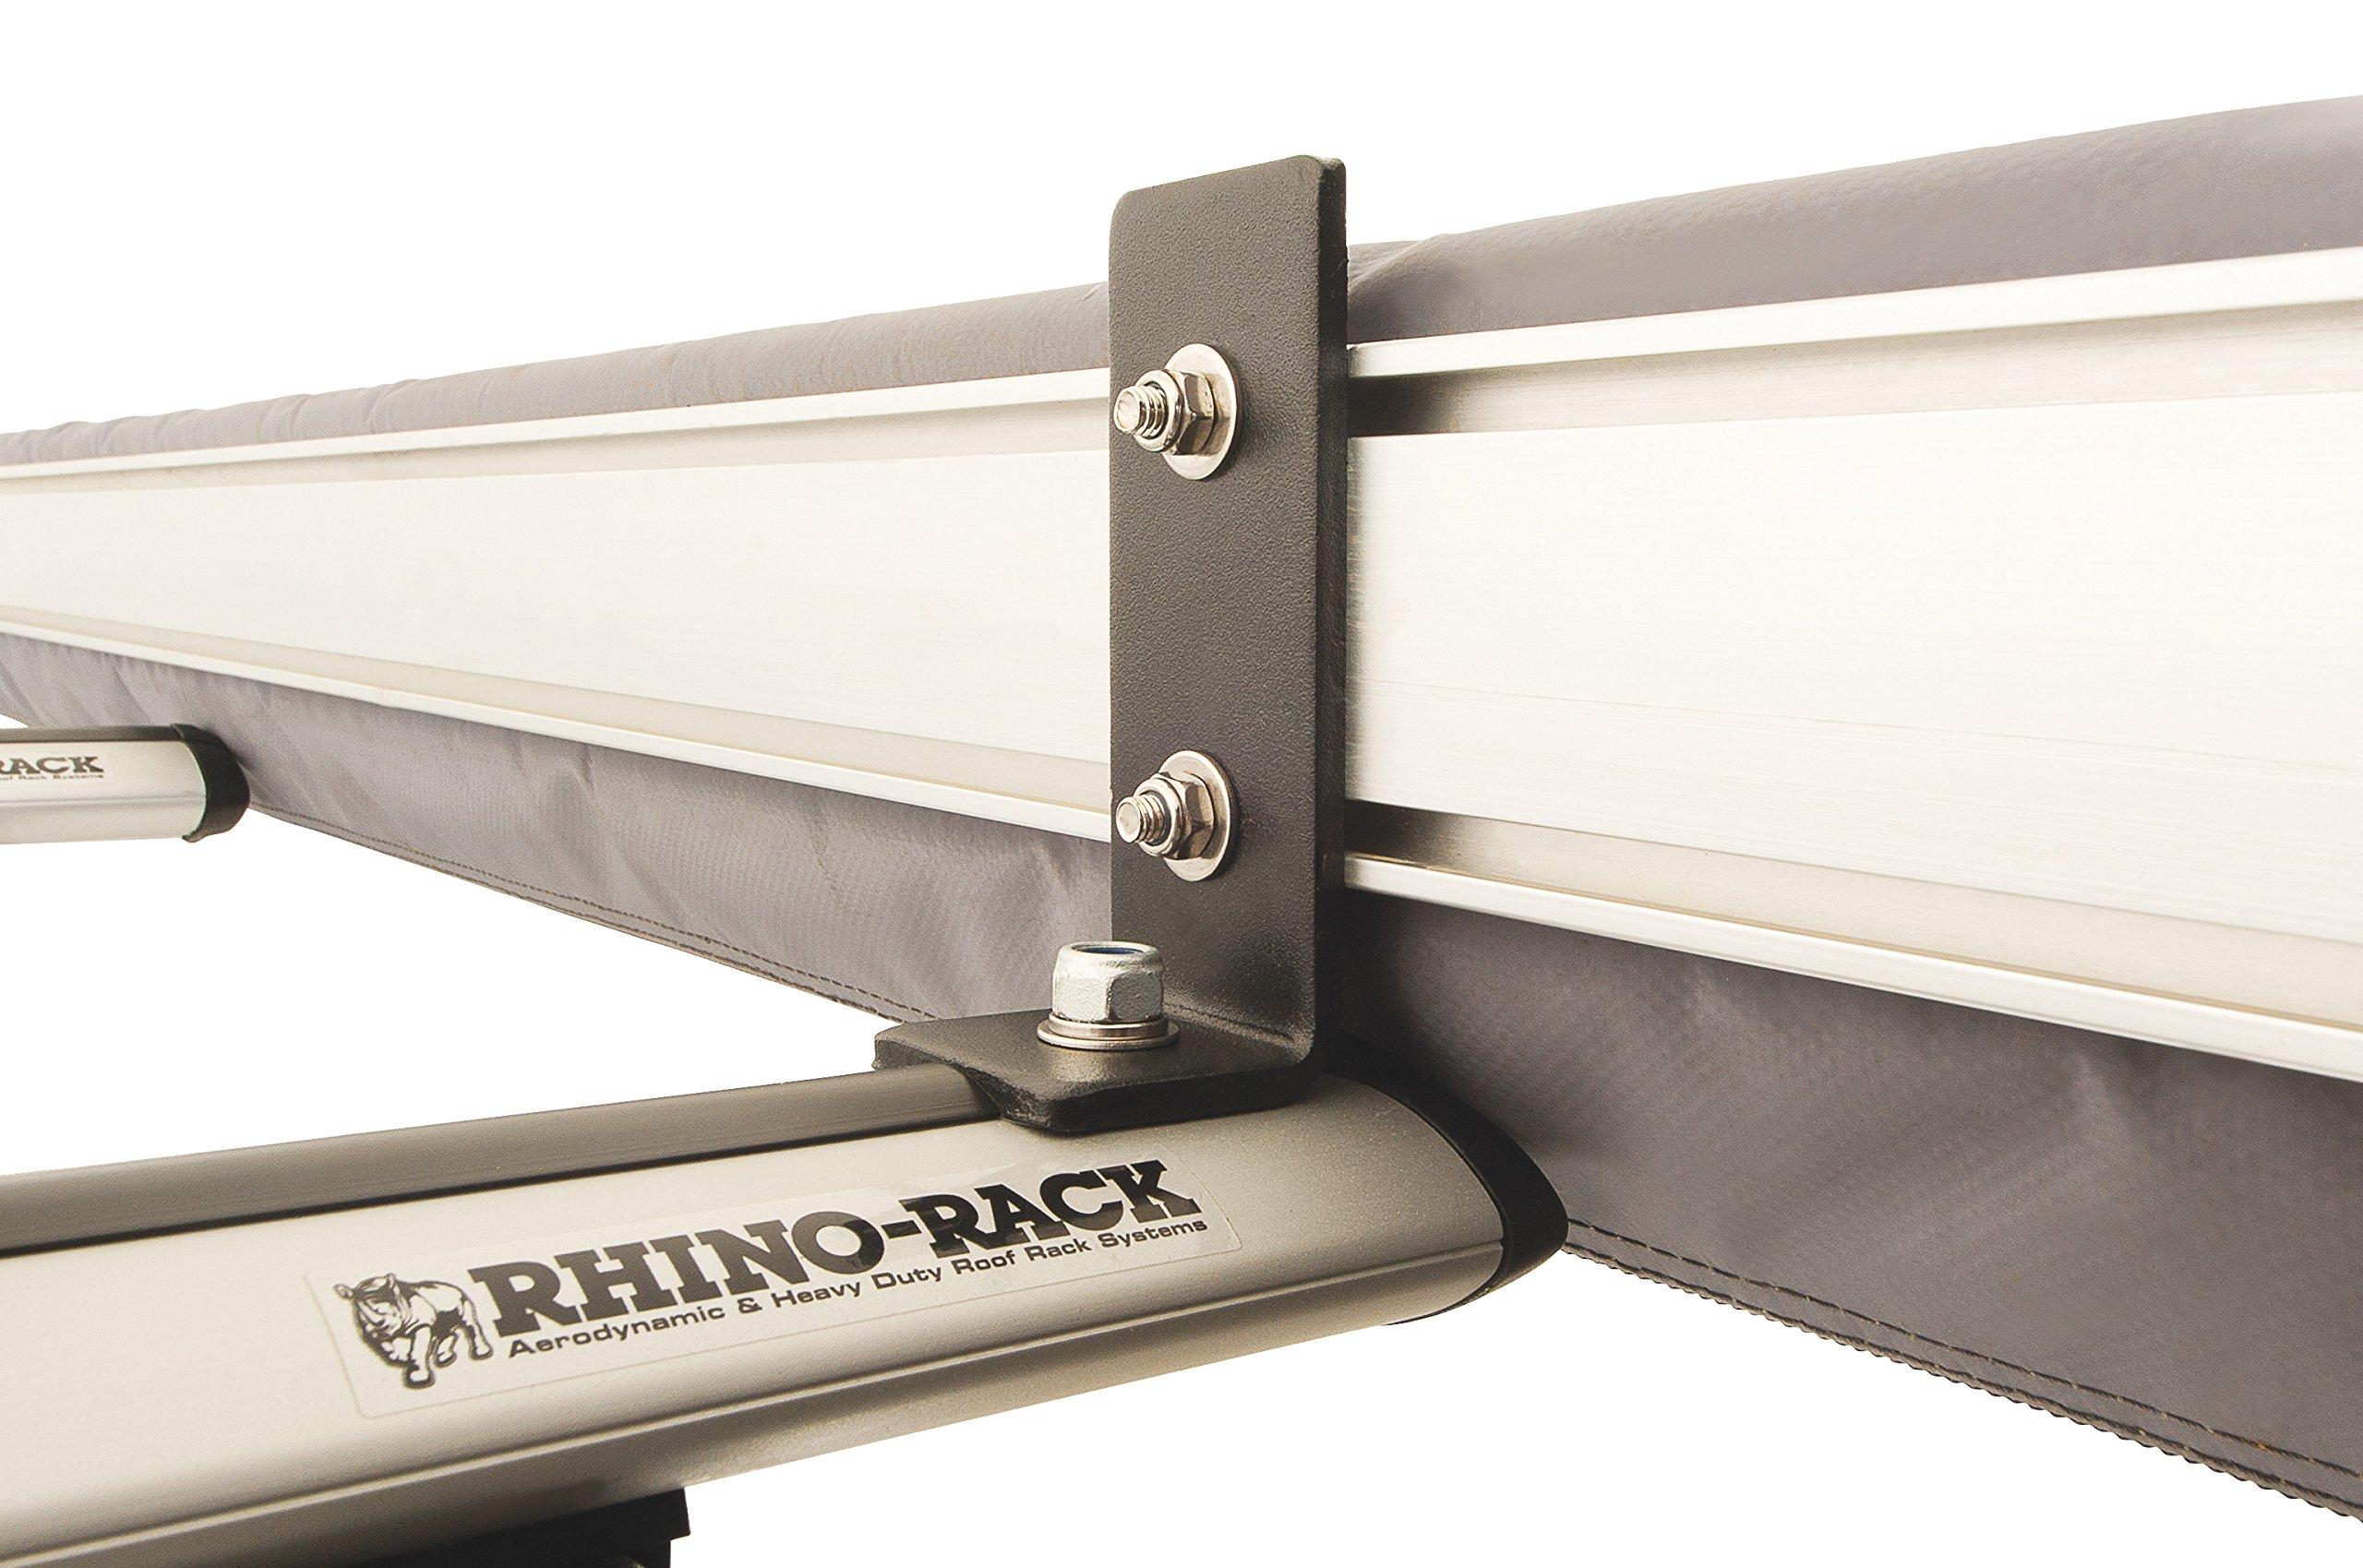 Rhino Rack Universal Awning Bracket Kit - Channel Awning ...